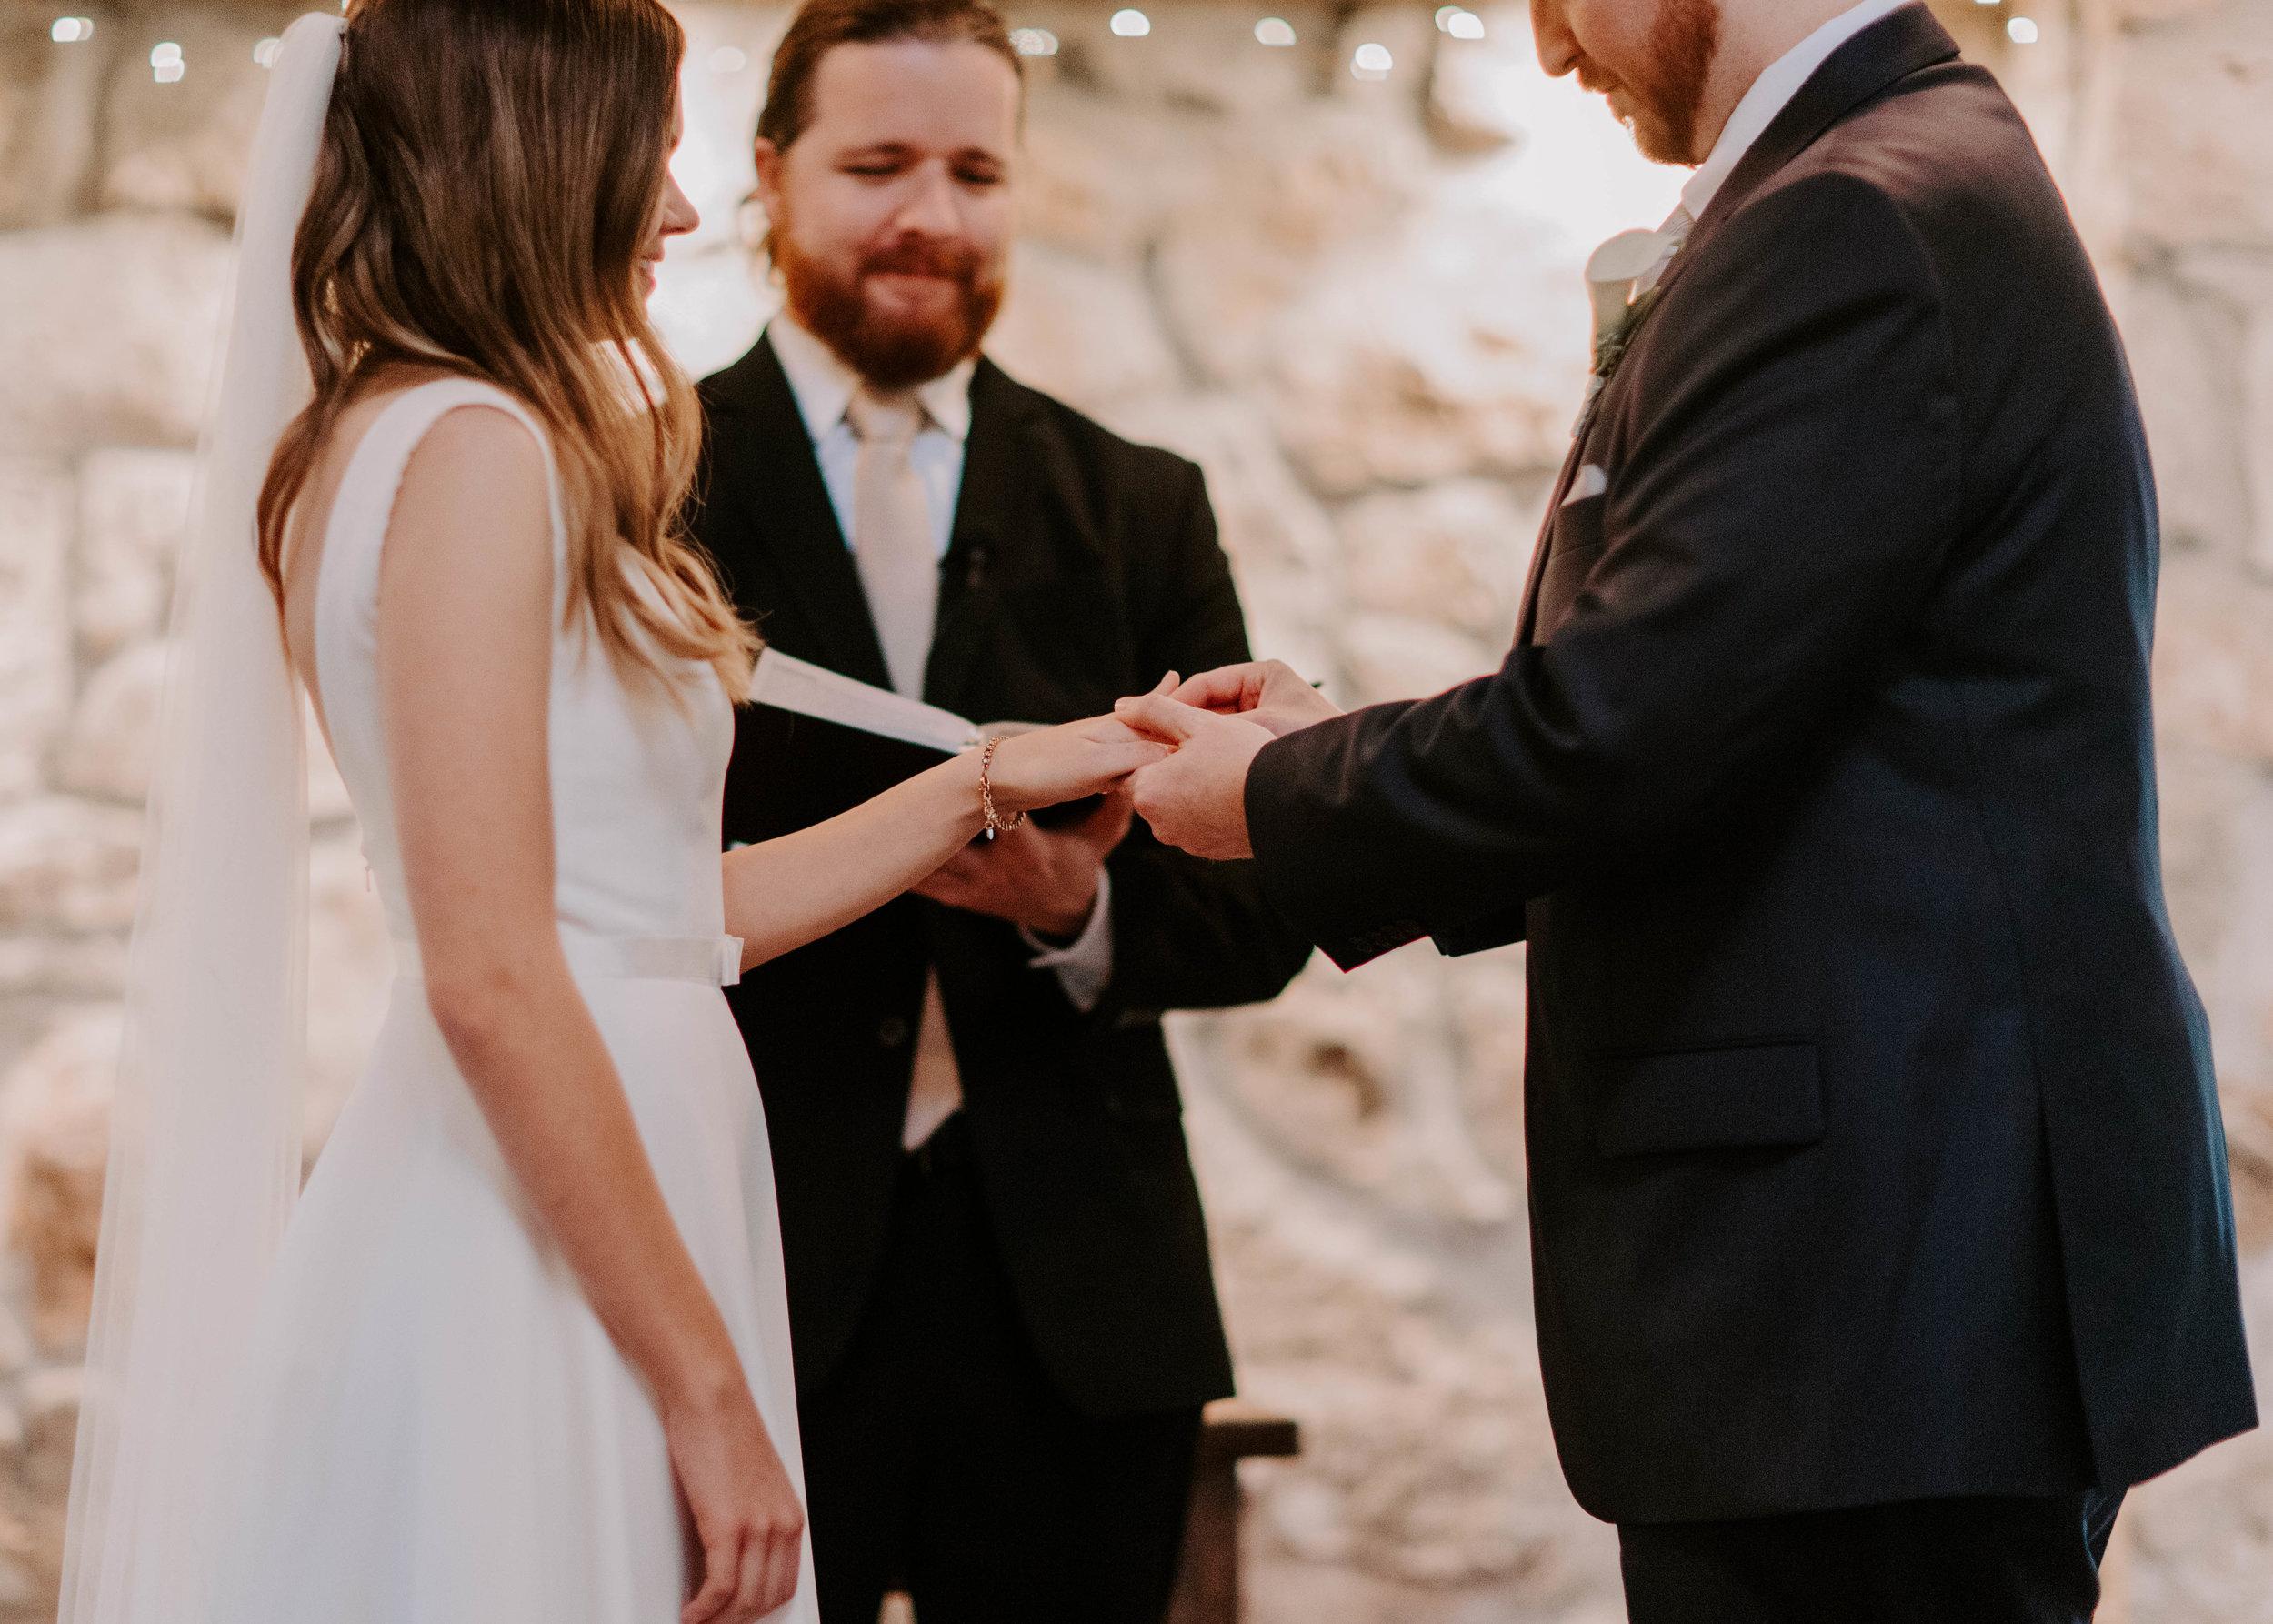 Brad_and_Karoline_Wedding-125.jpg